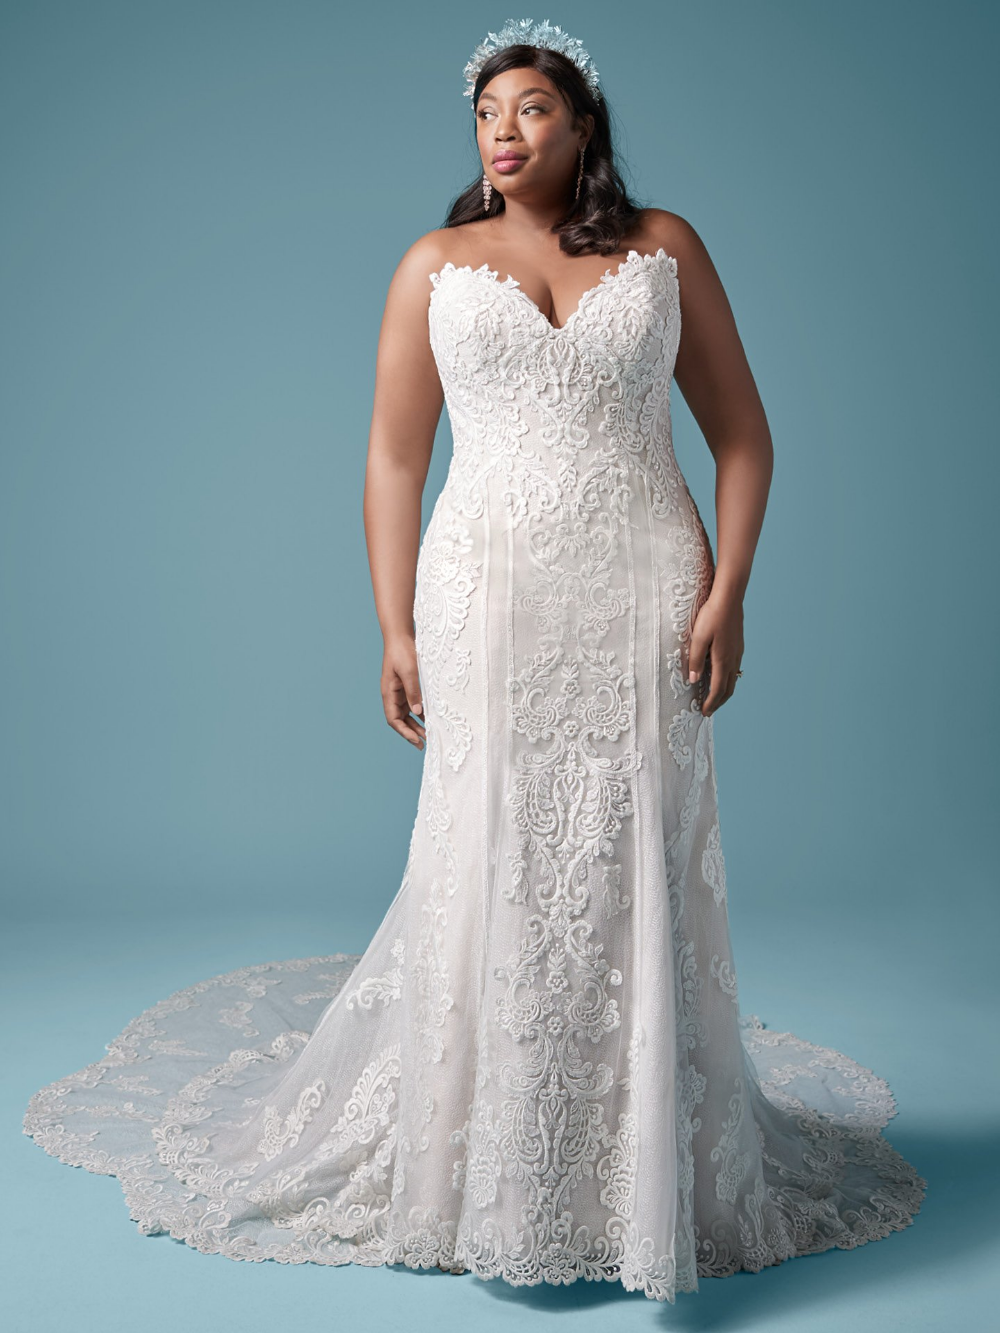 Erin Lynette Marie By Maggie Sottero Wedding Dresses Flattering Wedding Dress Maggie Sottero Wedding Dresses Wedding Dresses [ 1333 x 1000 Pixel ]